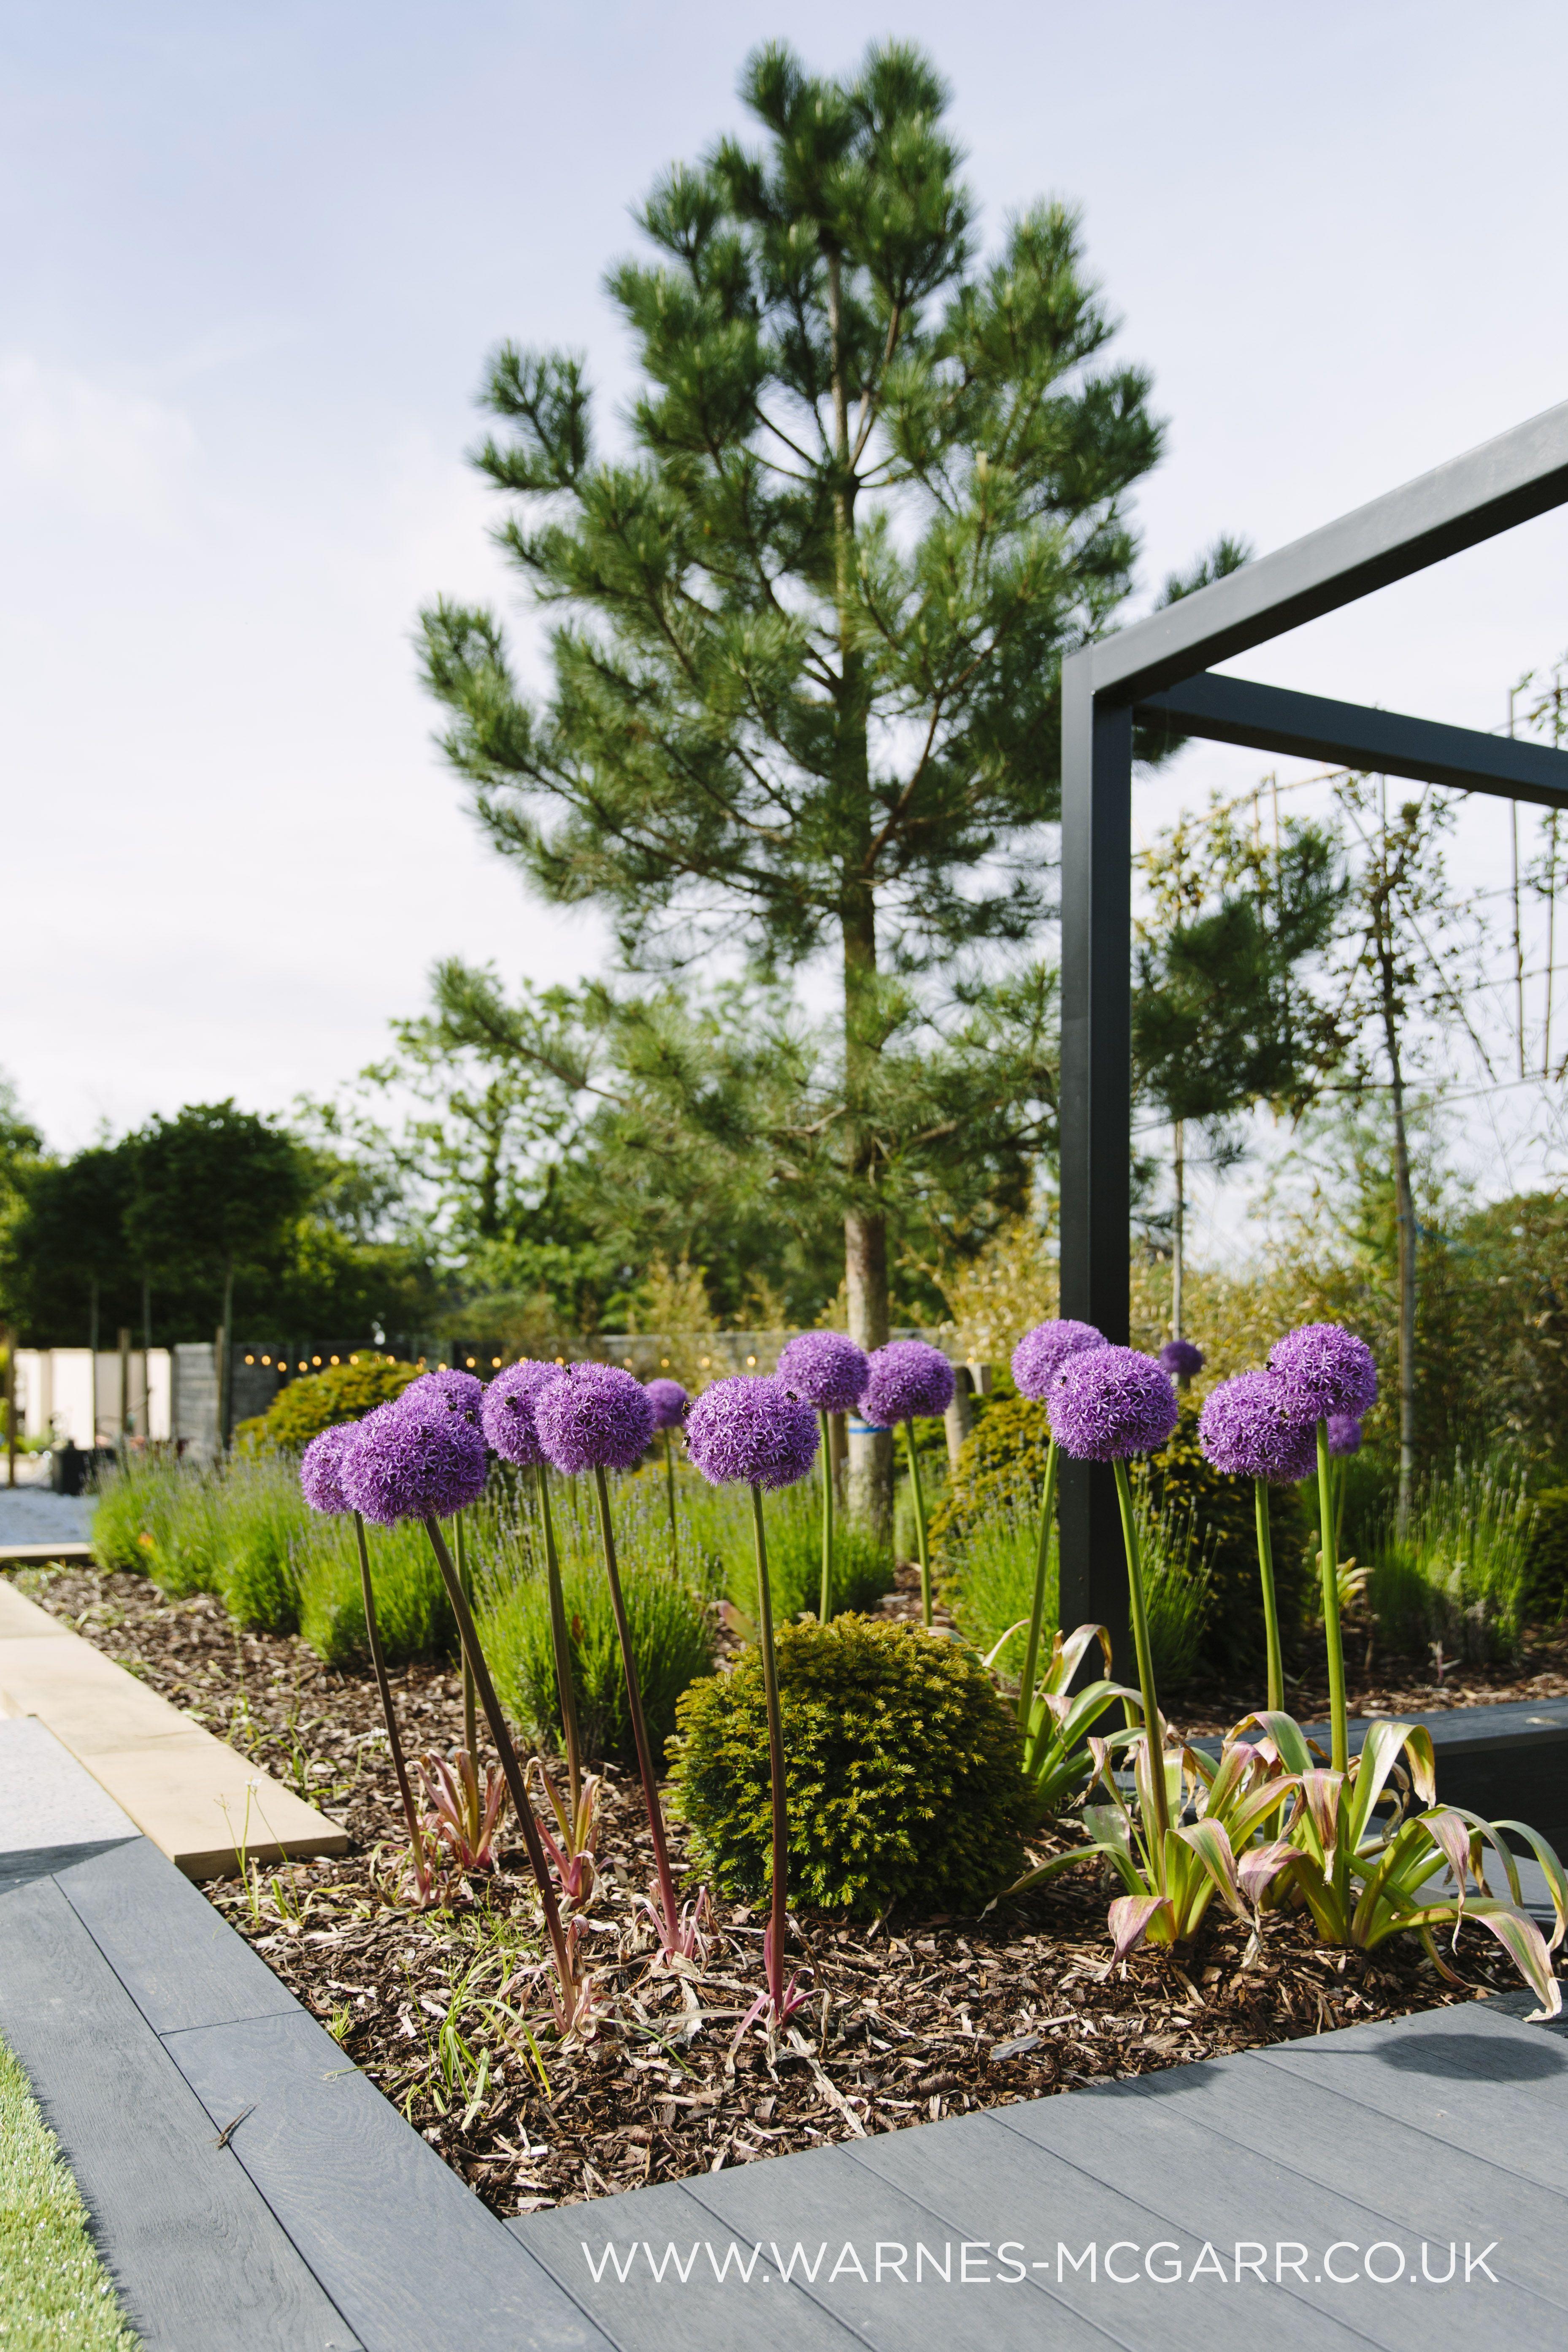 Garden Design For A Luxury Property In Ramsbottom Lancashire Warnes Mcgarr Co In 2020 Luxury Garden Luxury Garden Design Garden Design